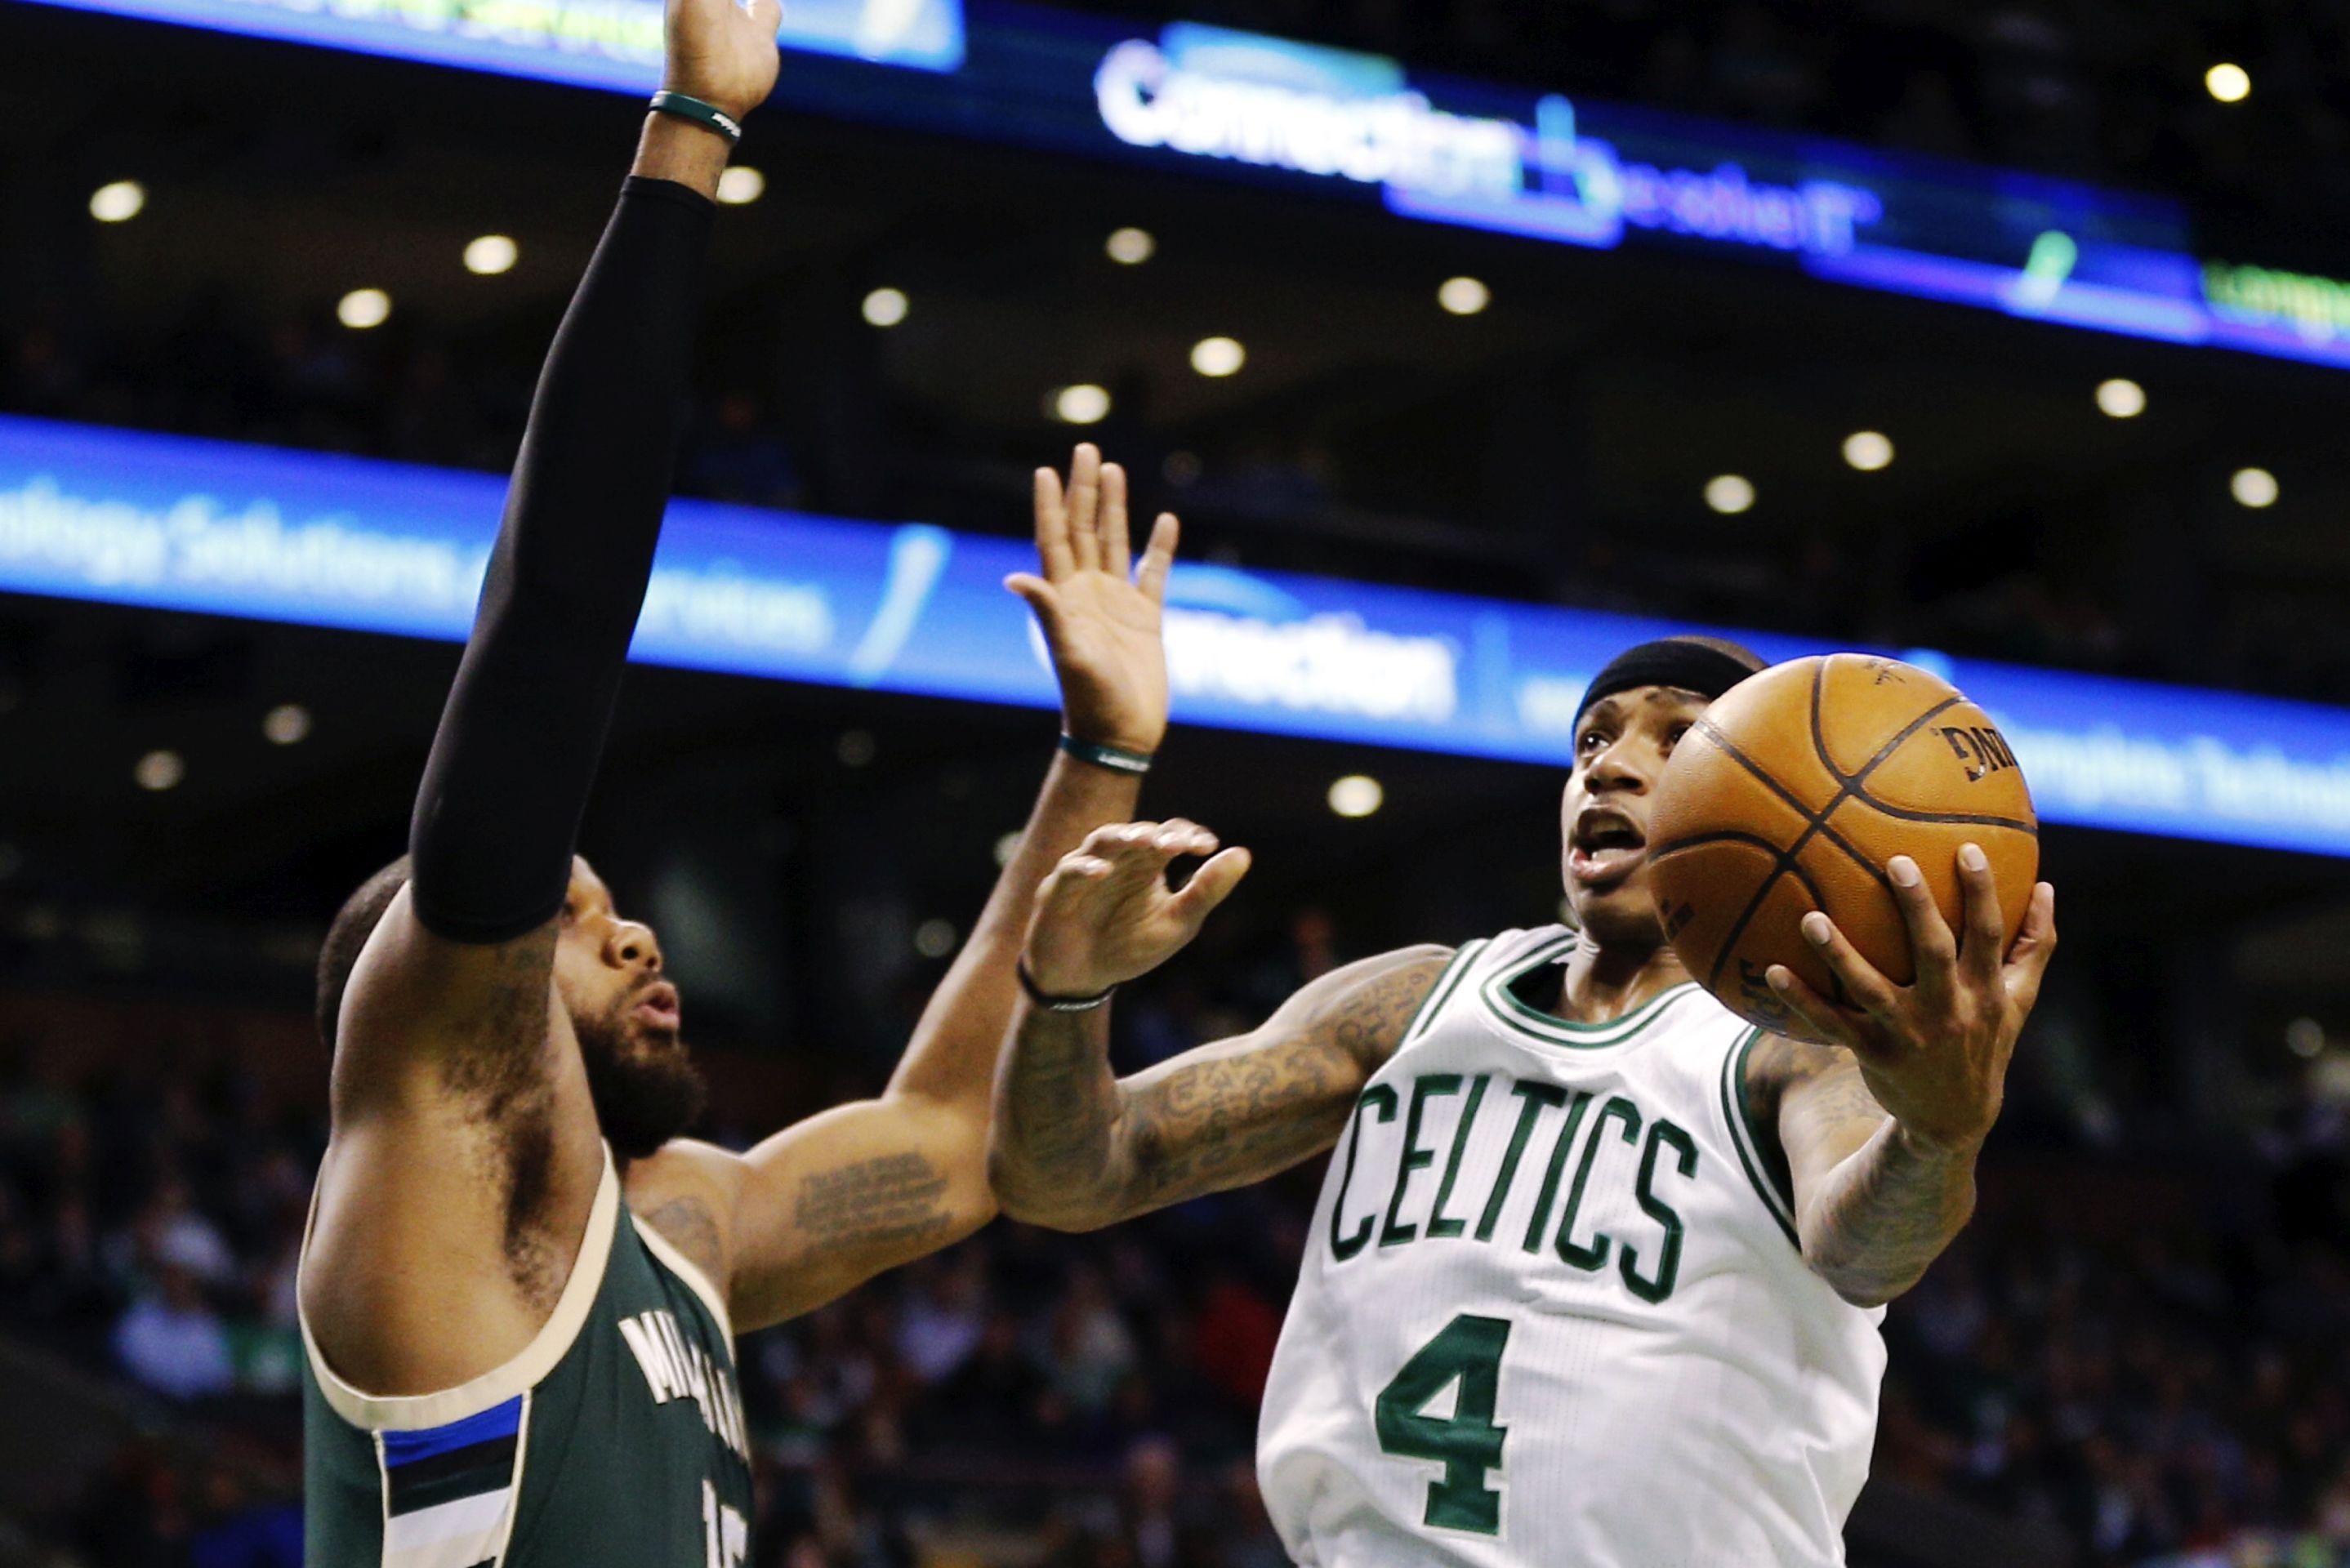 VIDEO: NBA ZAPLETENI ČVOR (Pre)ozlijeđeni Thomas vraća se u Boston?